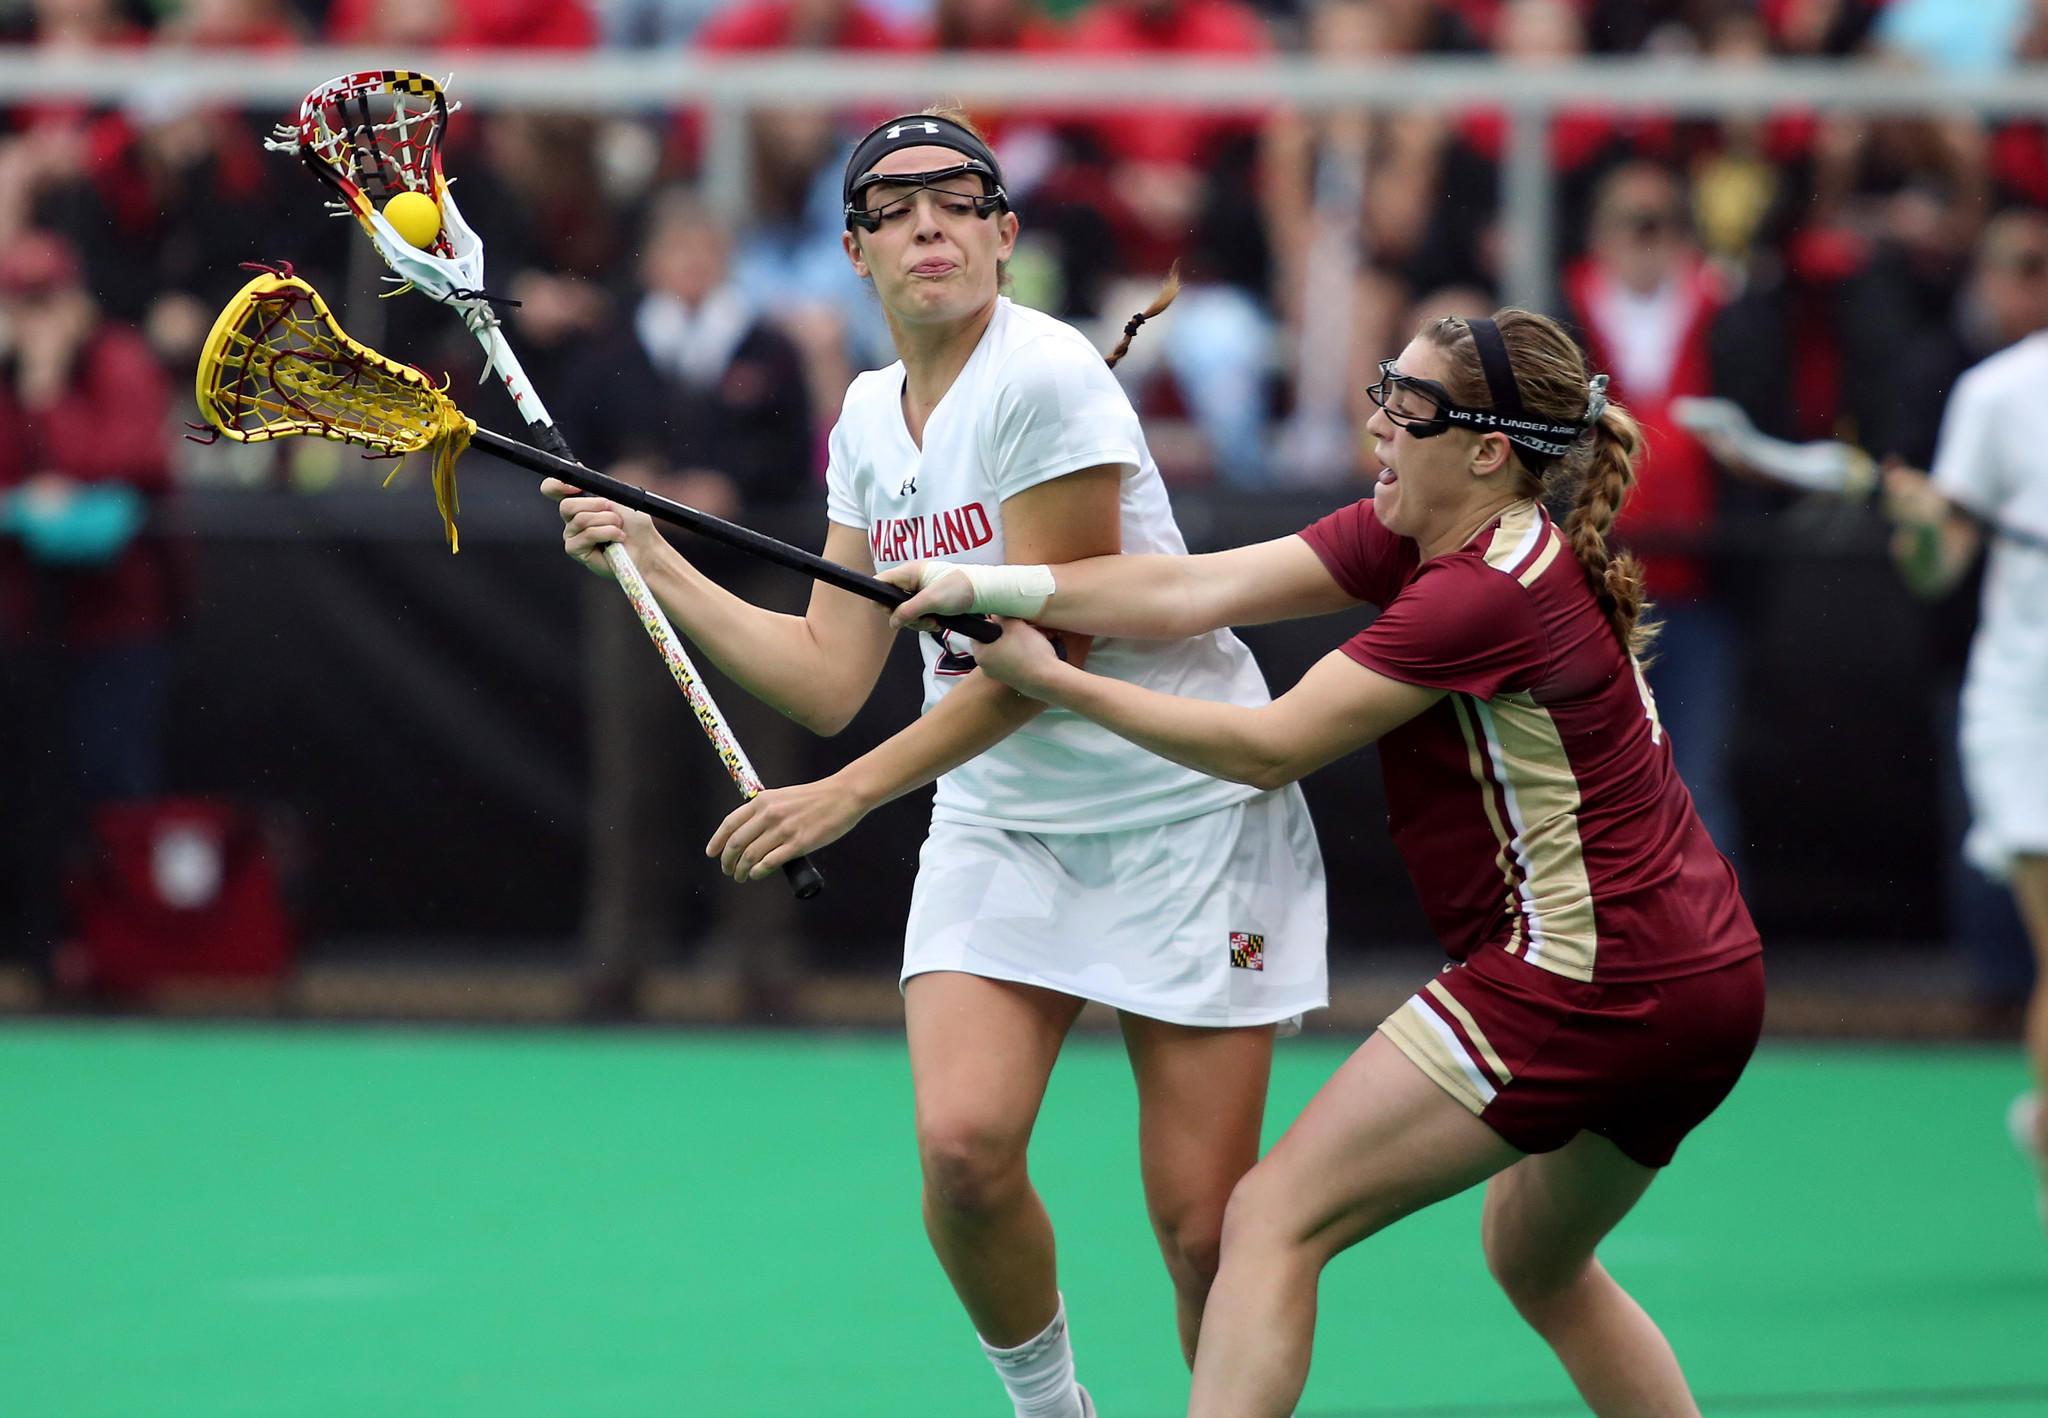 Boston College defender Stephanie Sabatini (right) plays solid defense against Maryland midfielder Taylor Cummings.